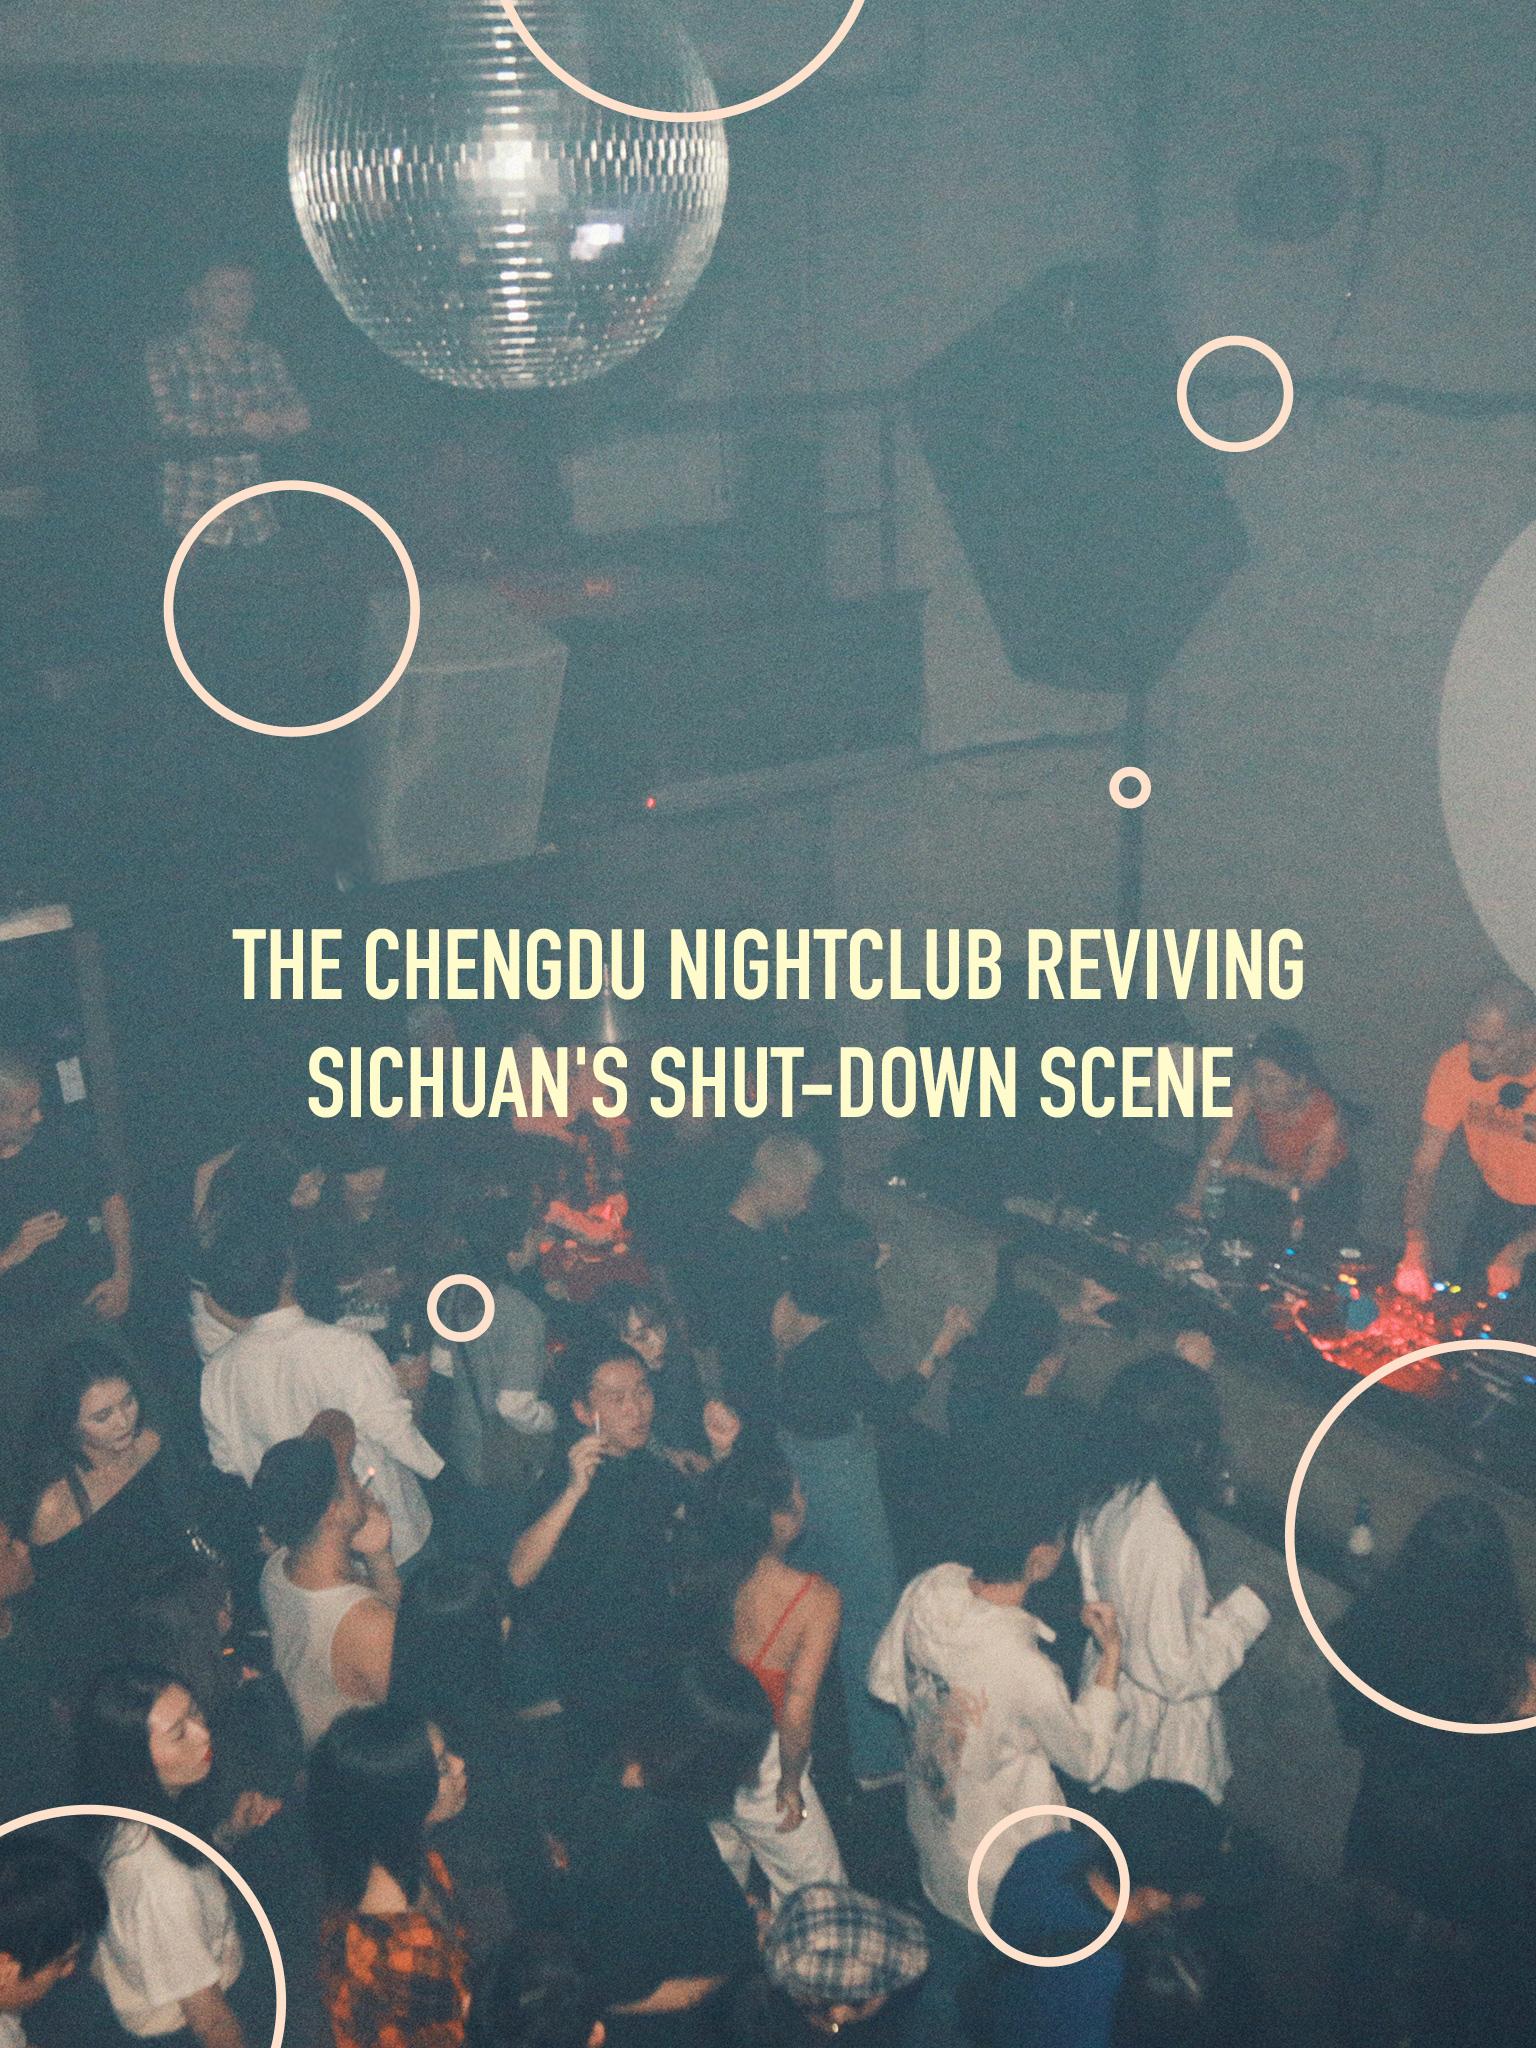 The Chengdu Nightclub Reviving Sichuan's Shut-Down Scene